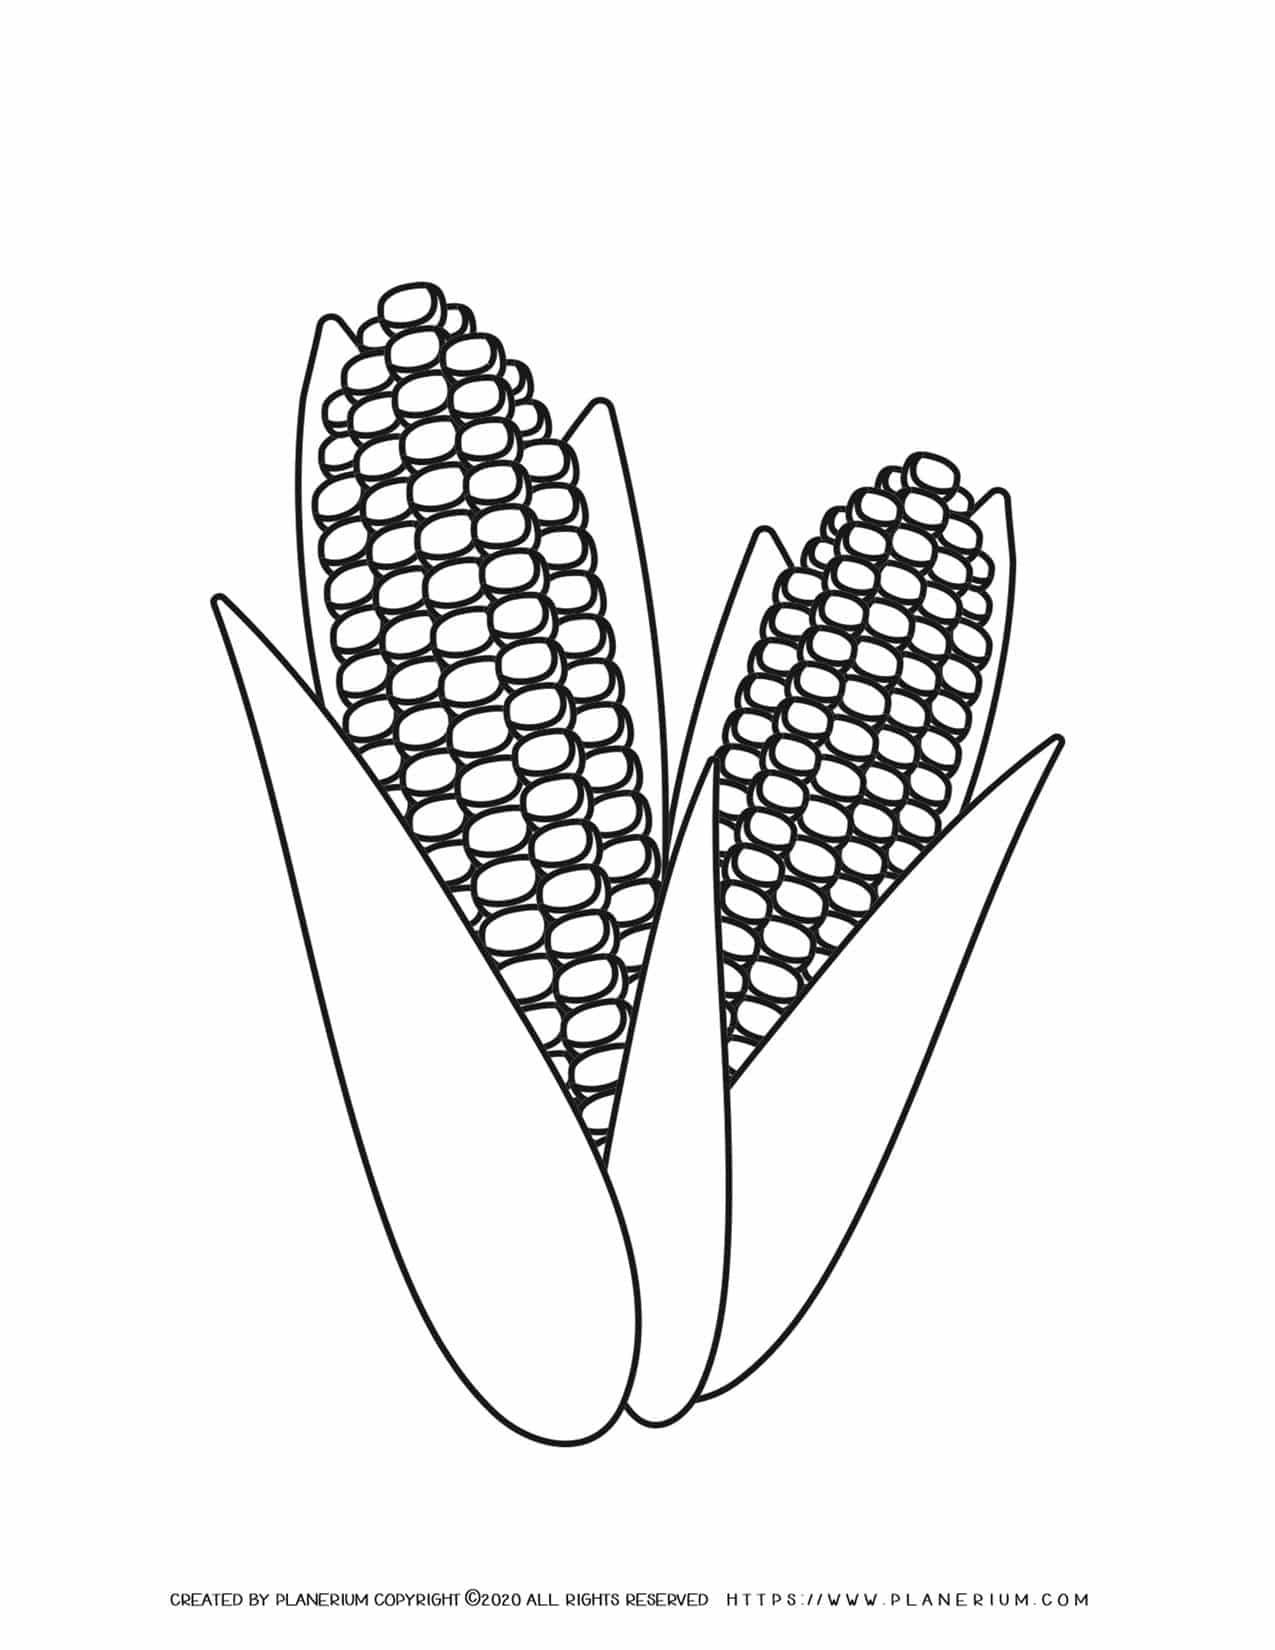 Corn - Coloring Page | Planerium